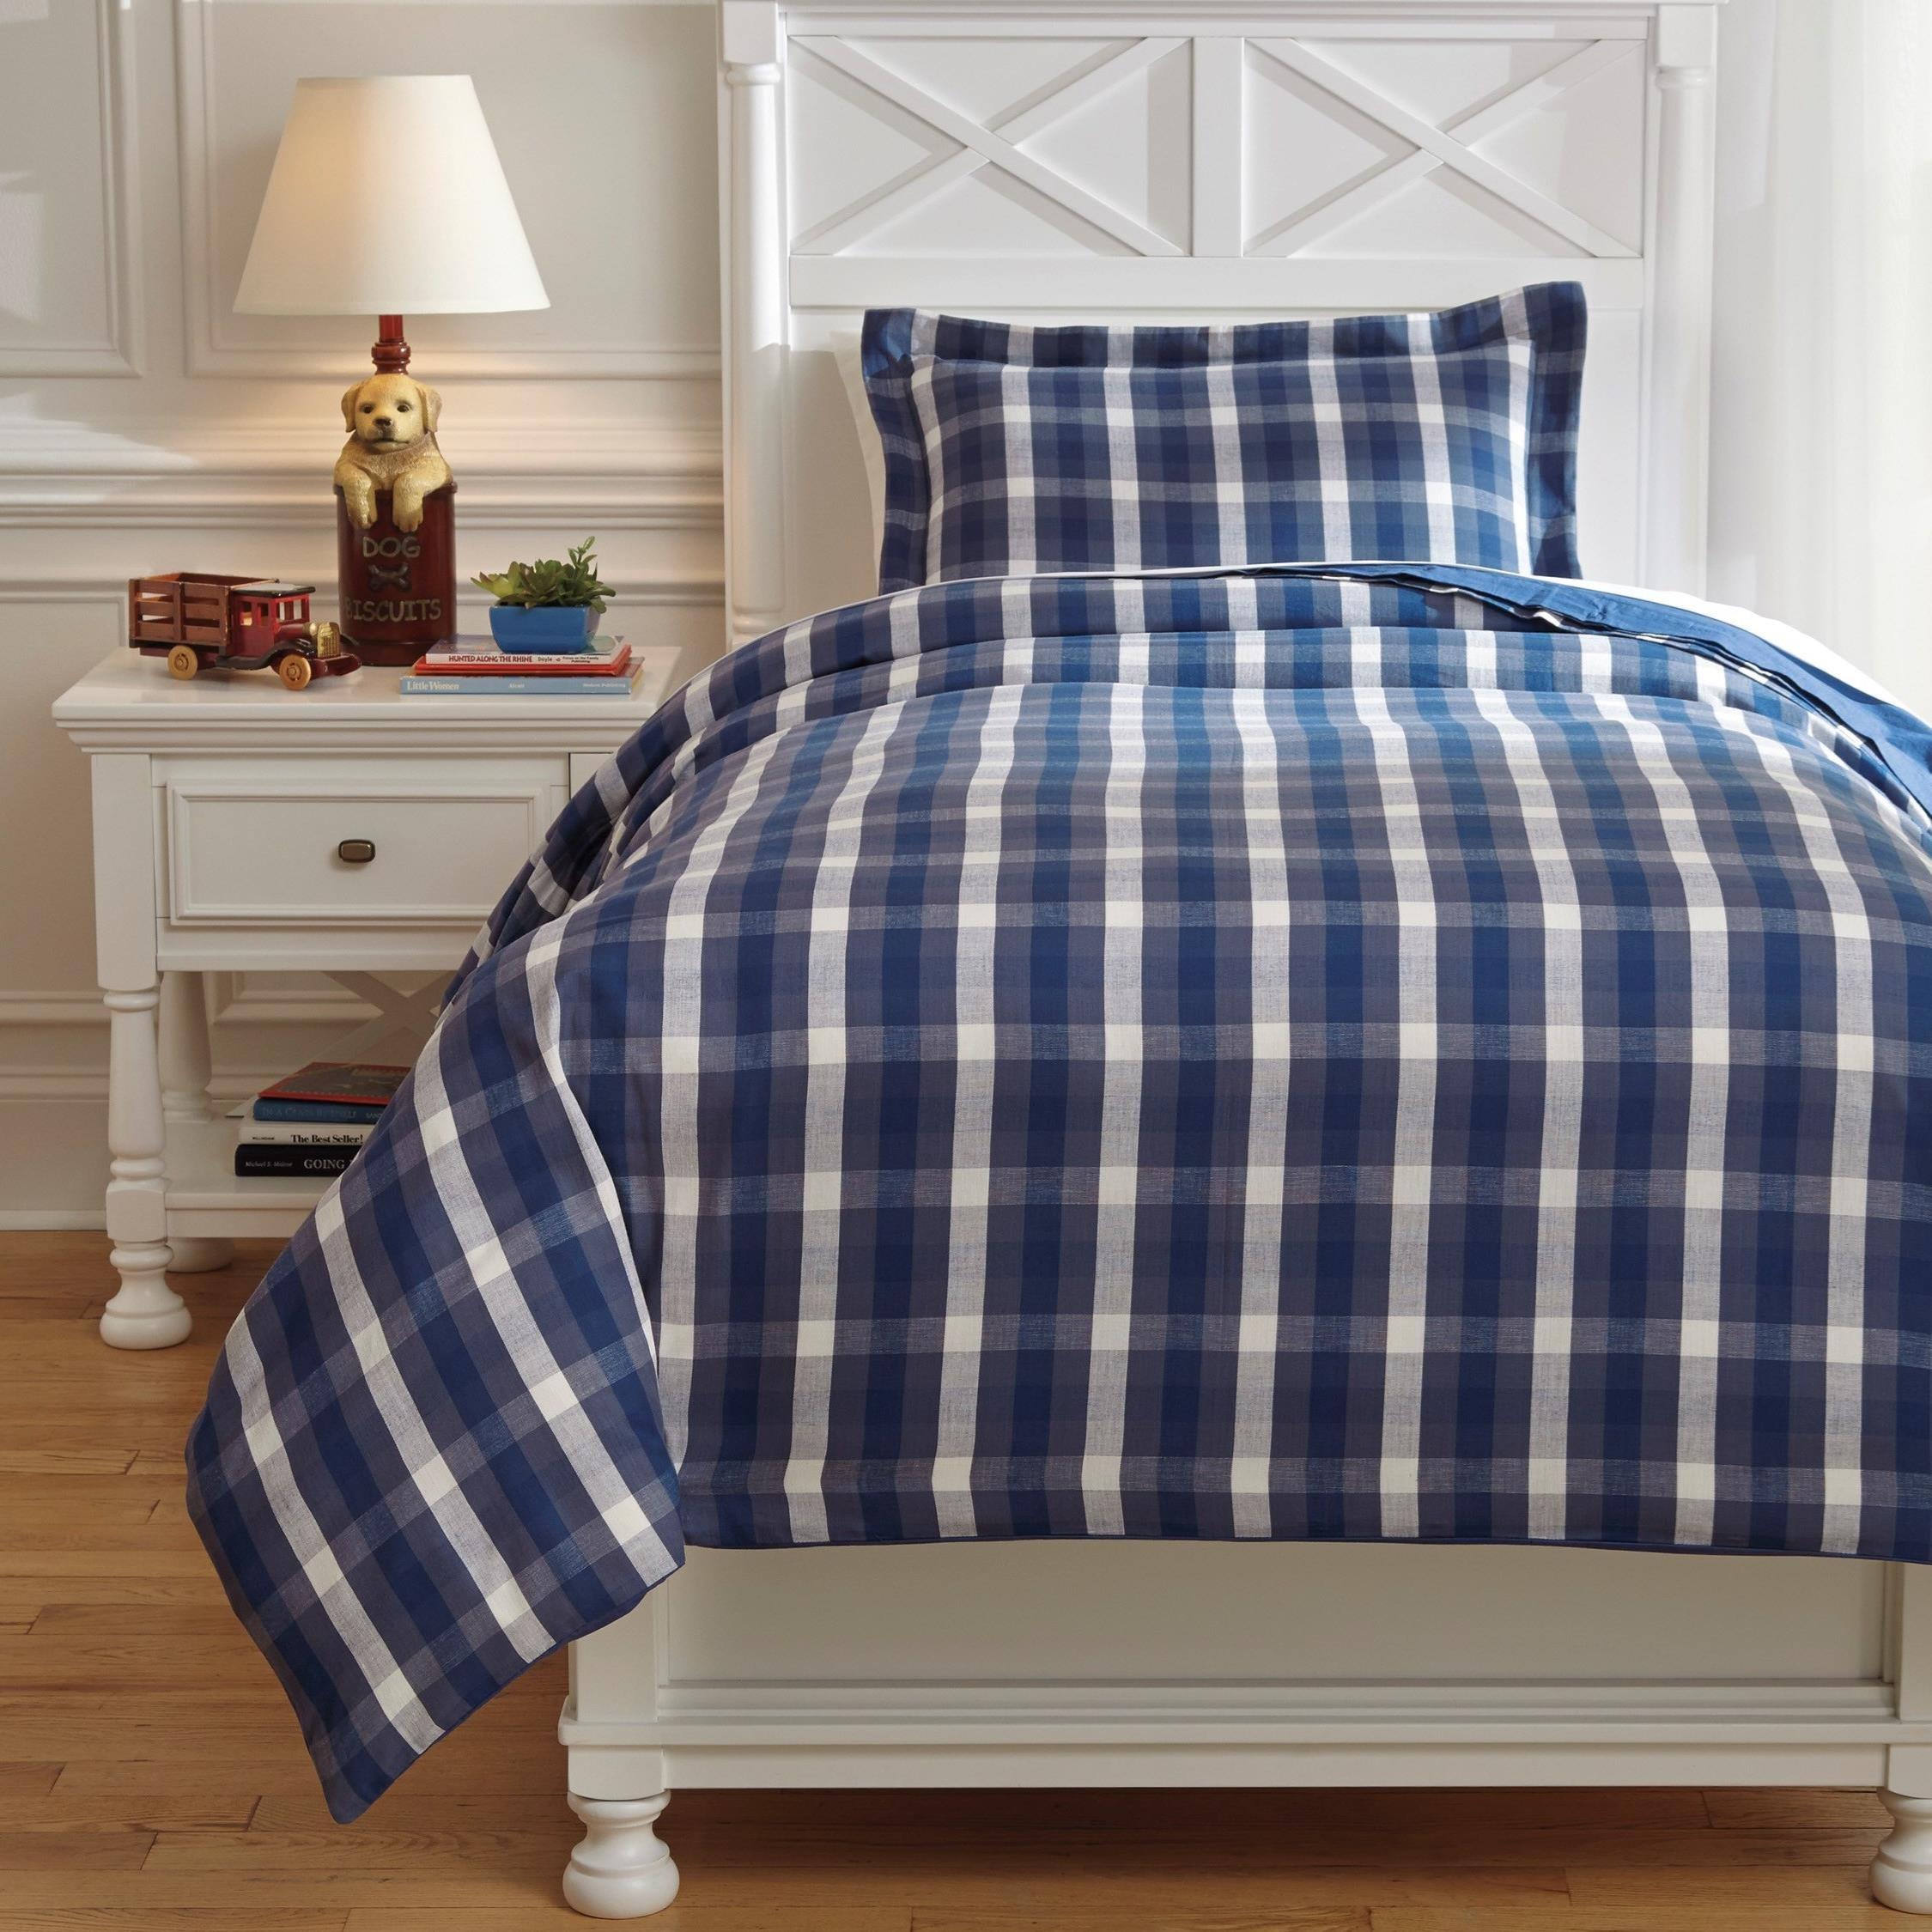 Bedding Sets Twin Baret Blue Duvet Cover Set by Signature Design by Ashley at Lapeer Furniture & Mattress Center